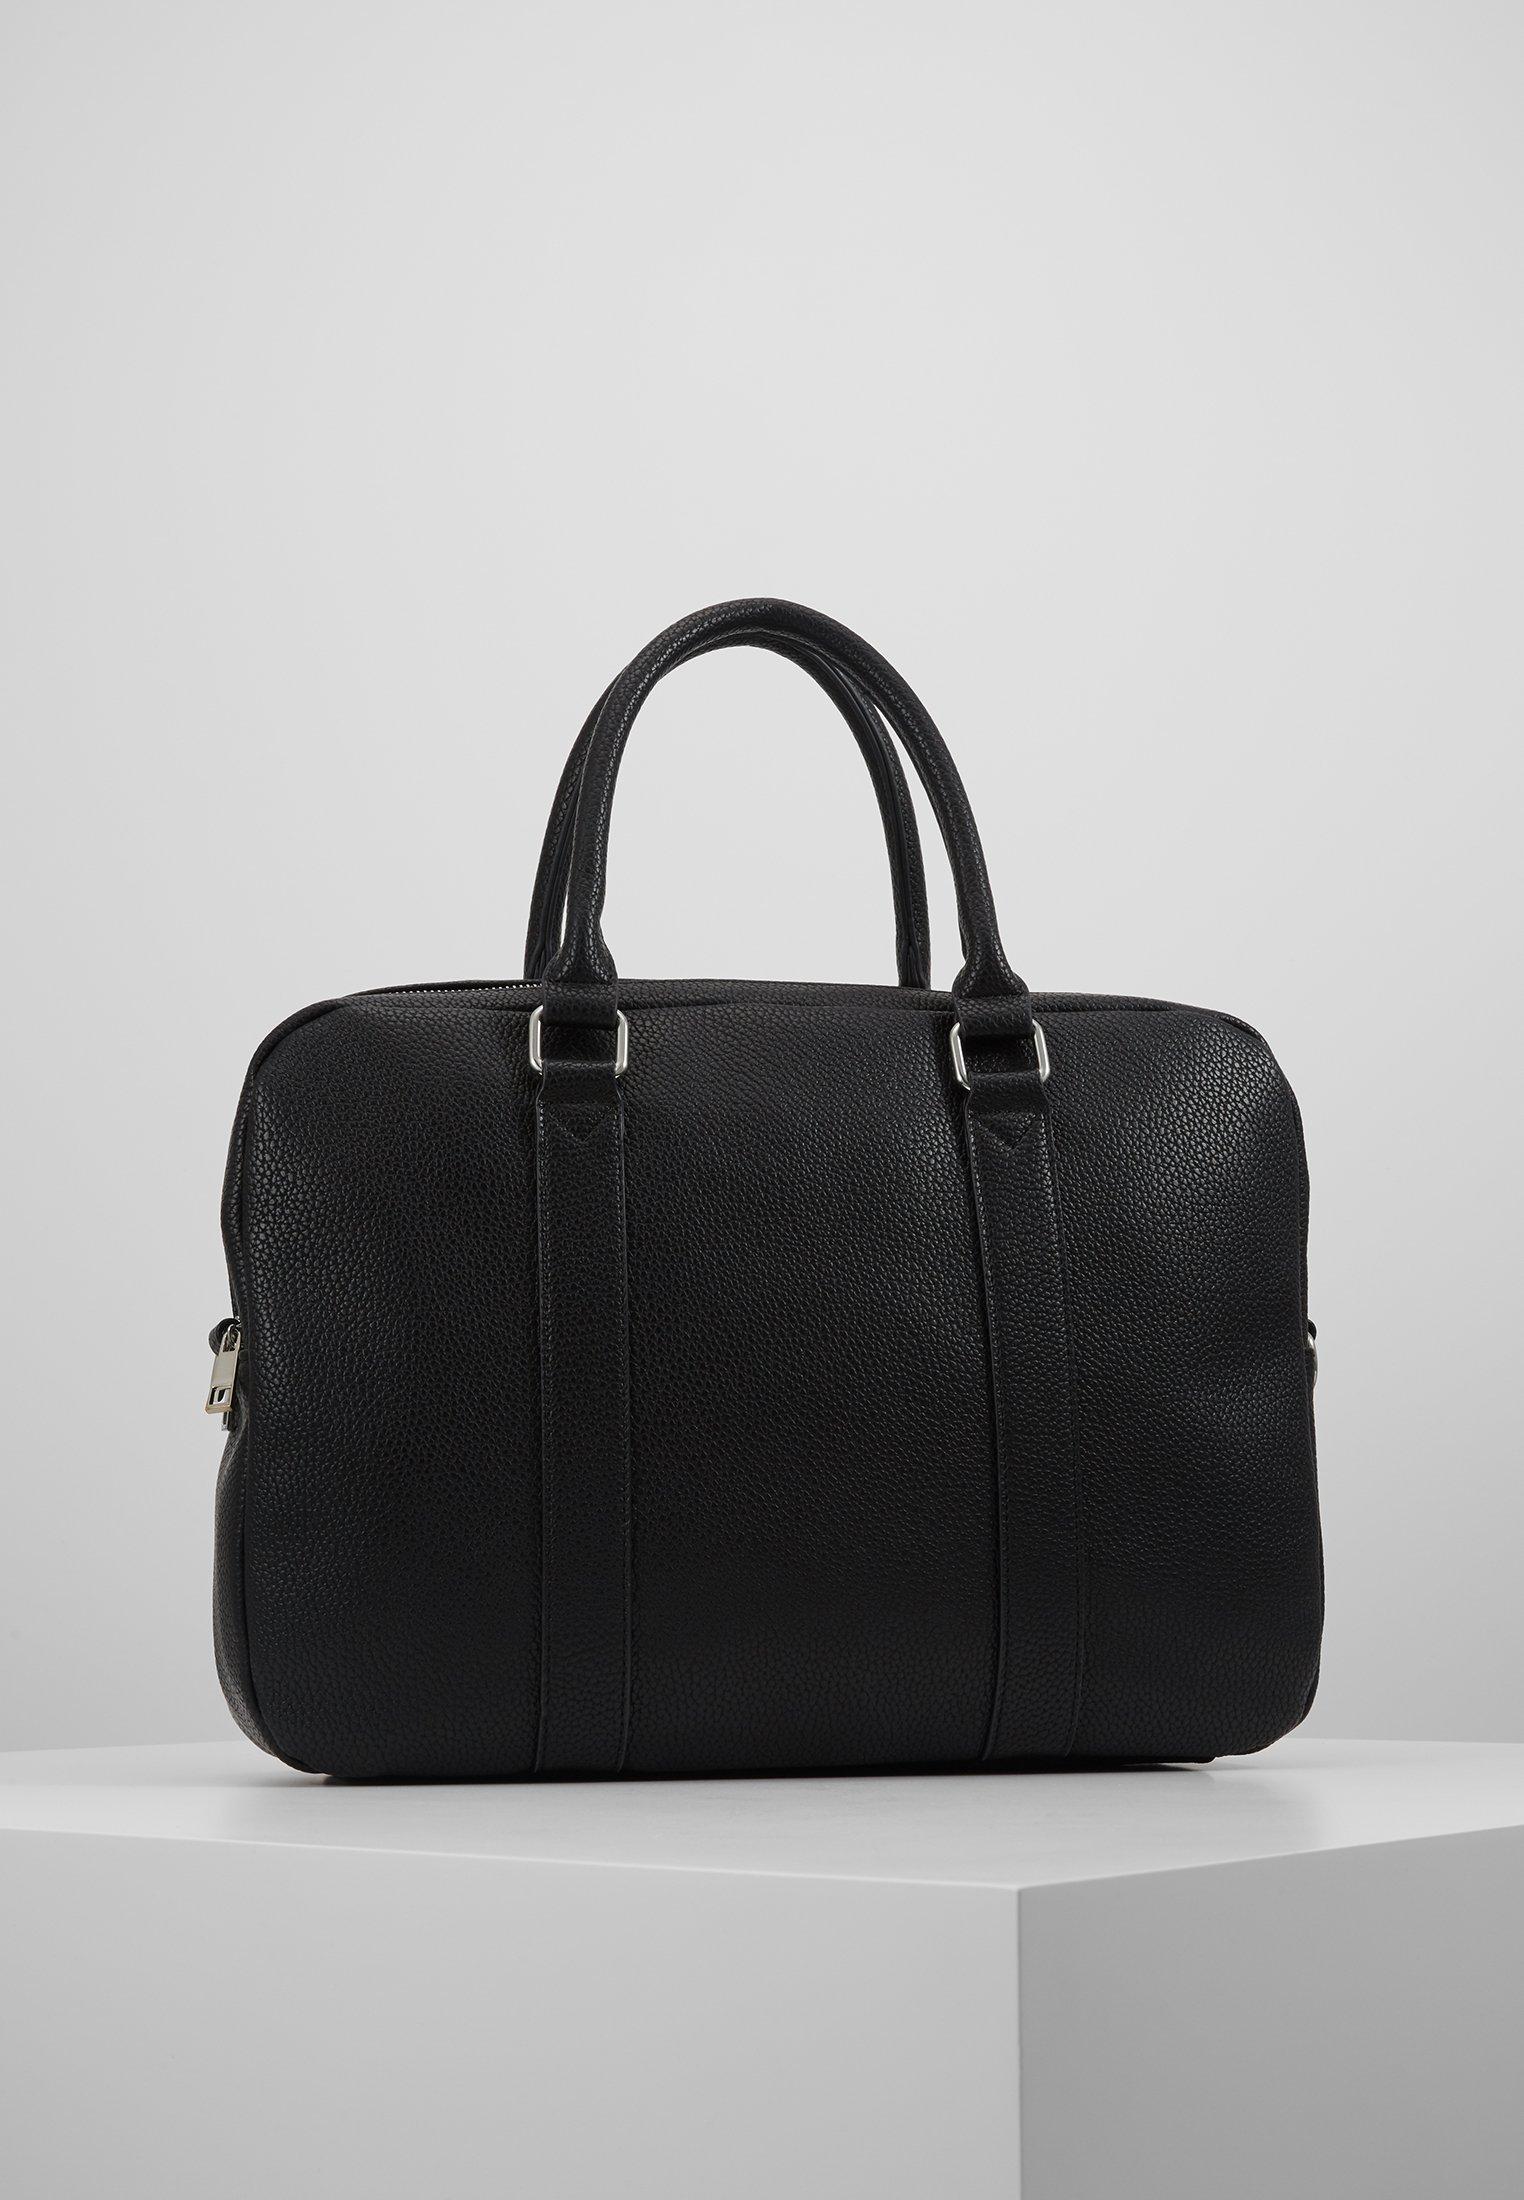 Pier One Attachetasker - black